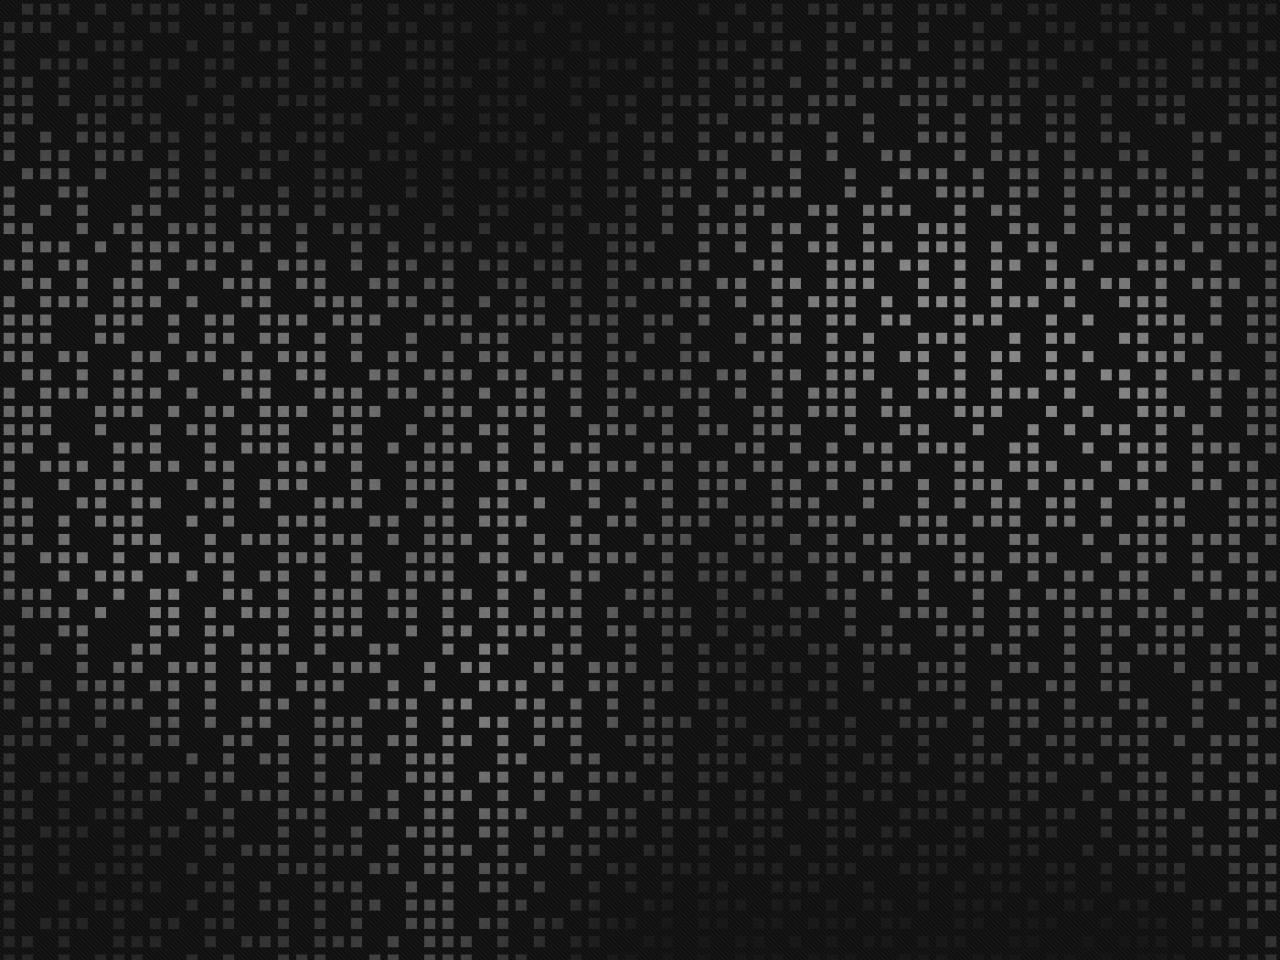 [Resim: textures_v1_33vcso8.jpg]